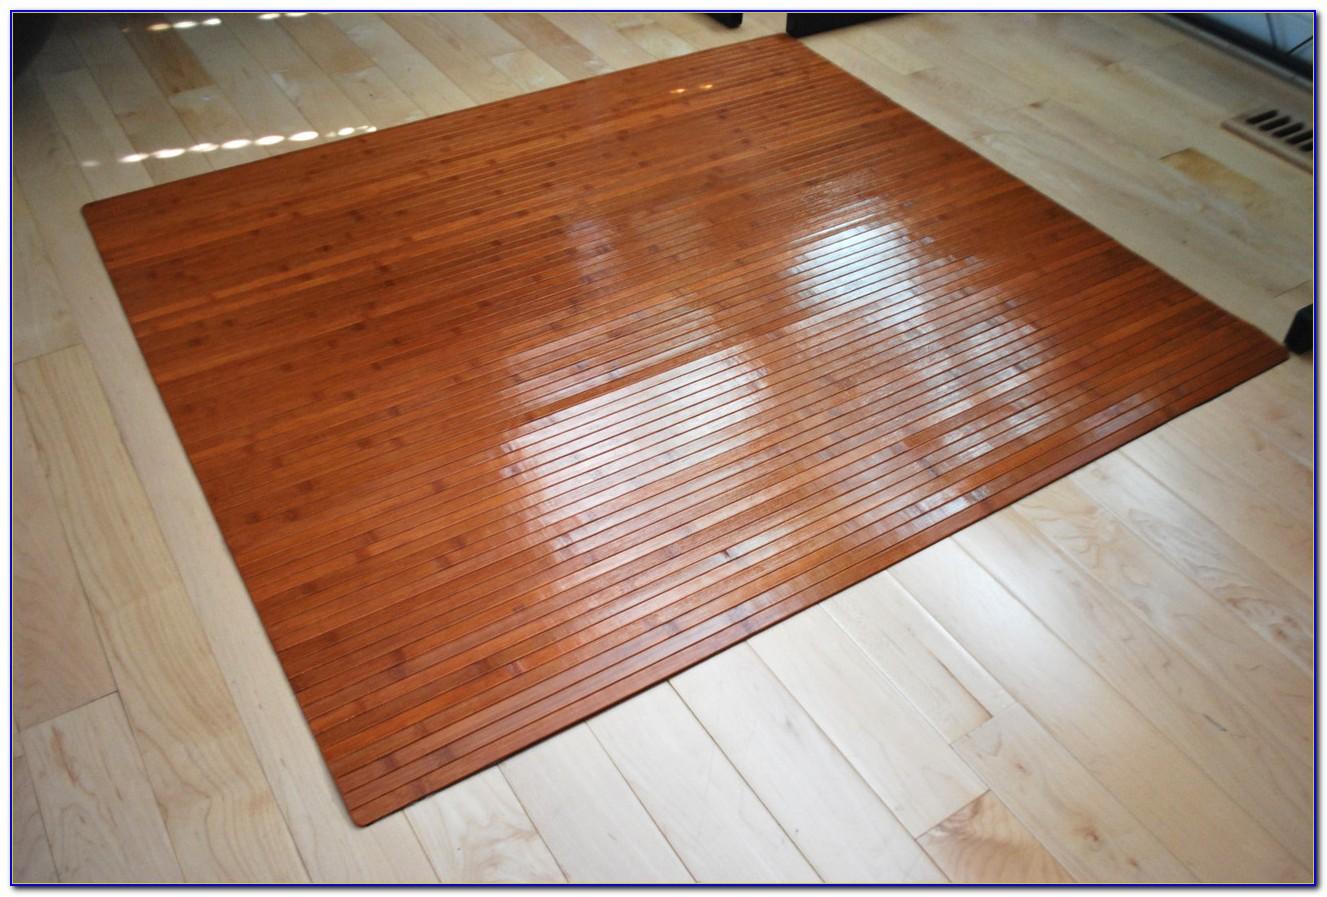 Wood Floor Protectors For Chair Legs